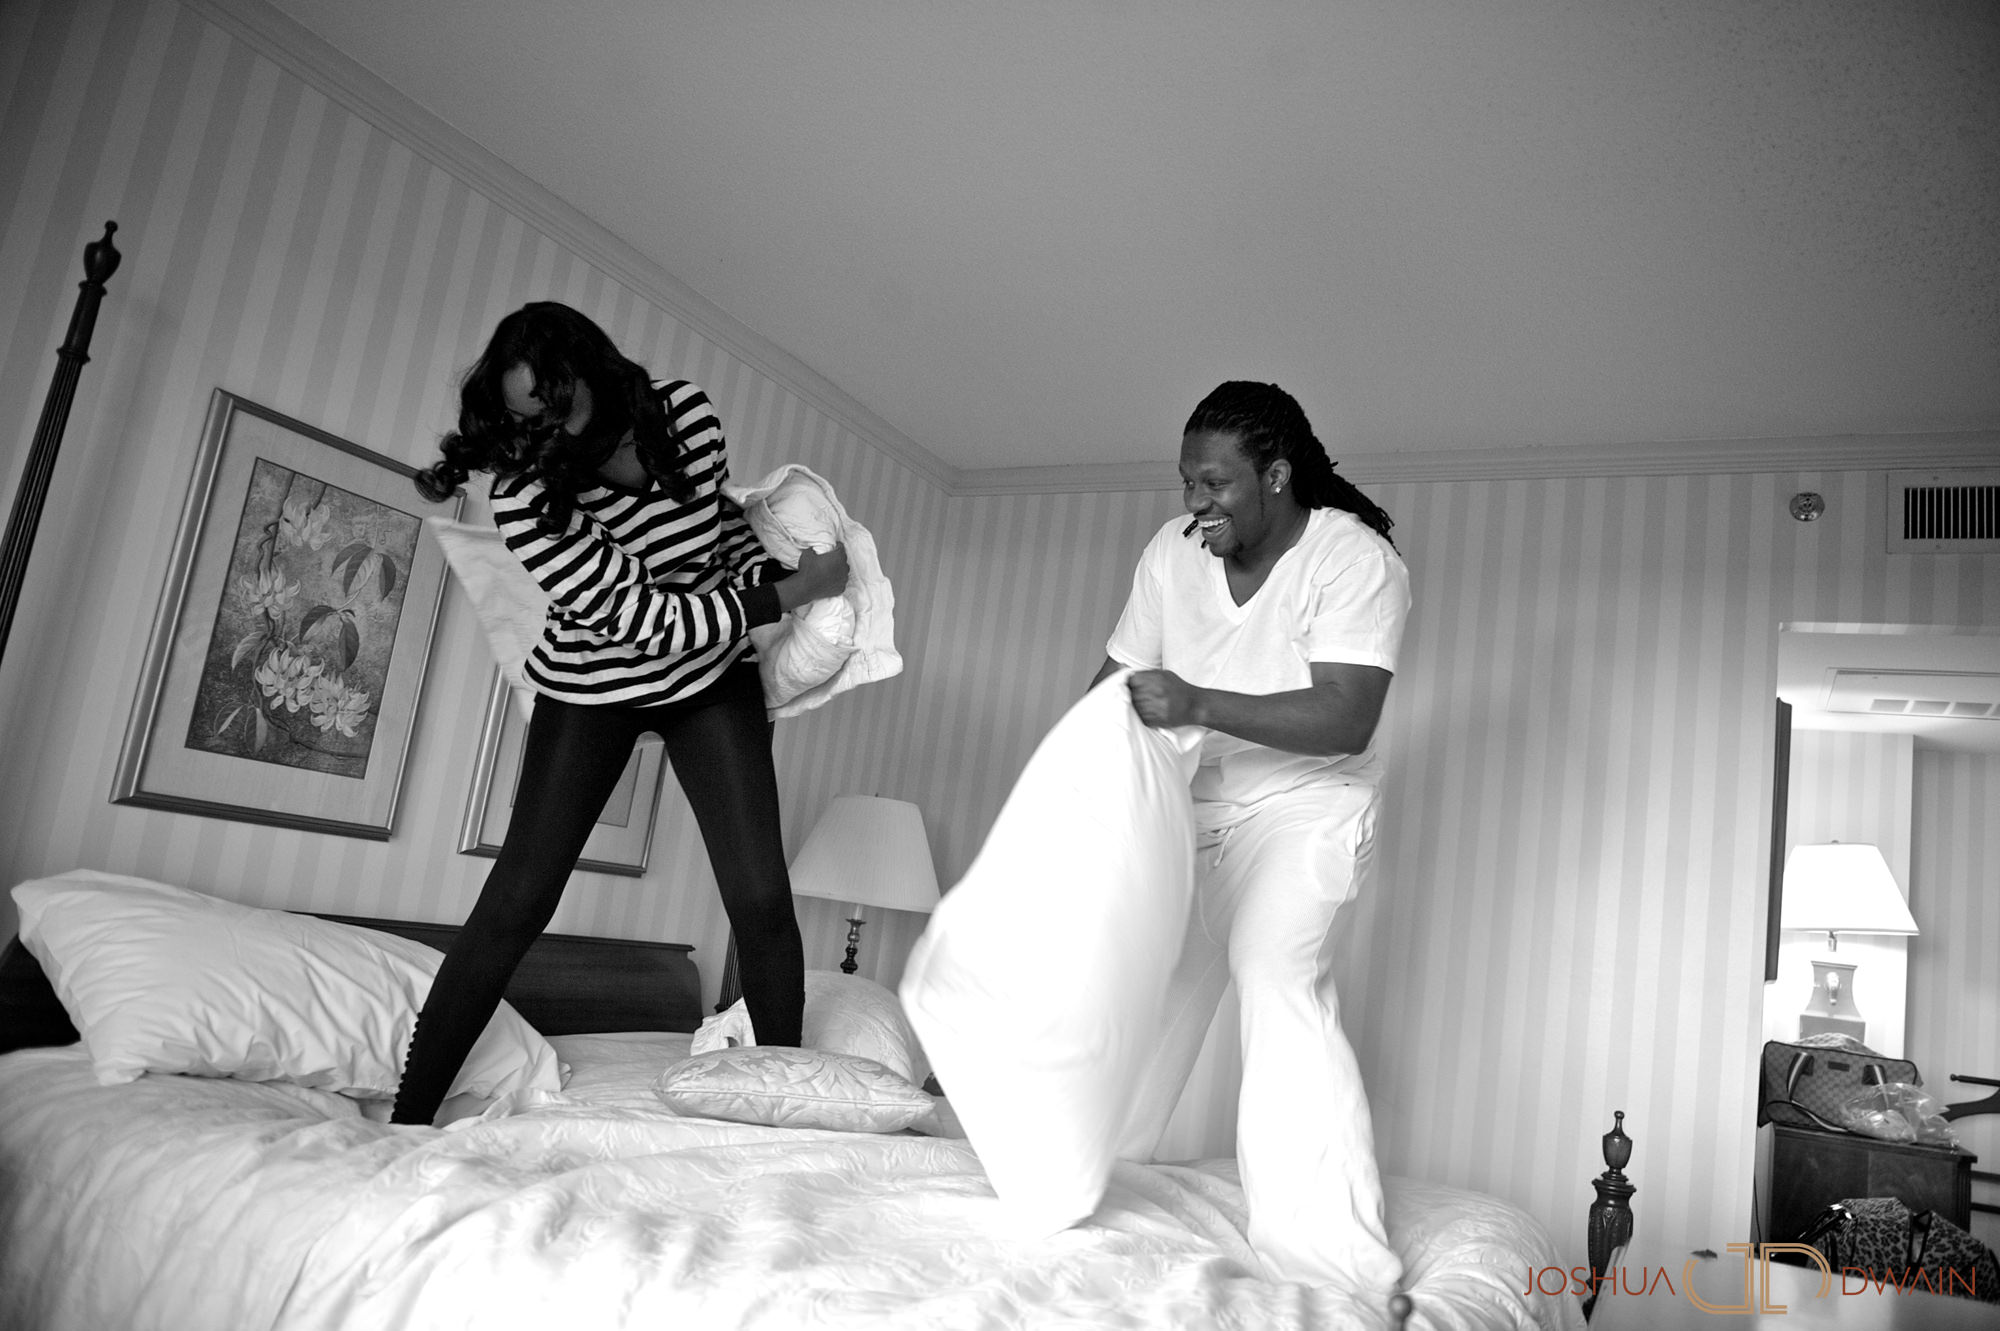 aretha-james-021-new-orleans-engagement-photographer-joshua-dwain-20101209_aj_315